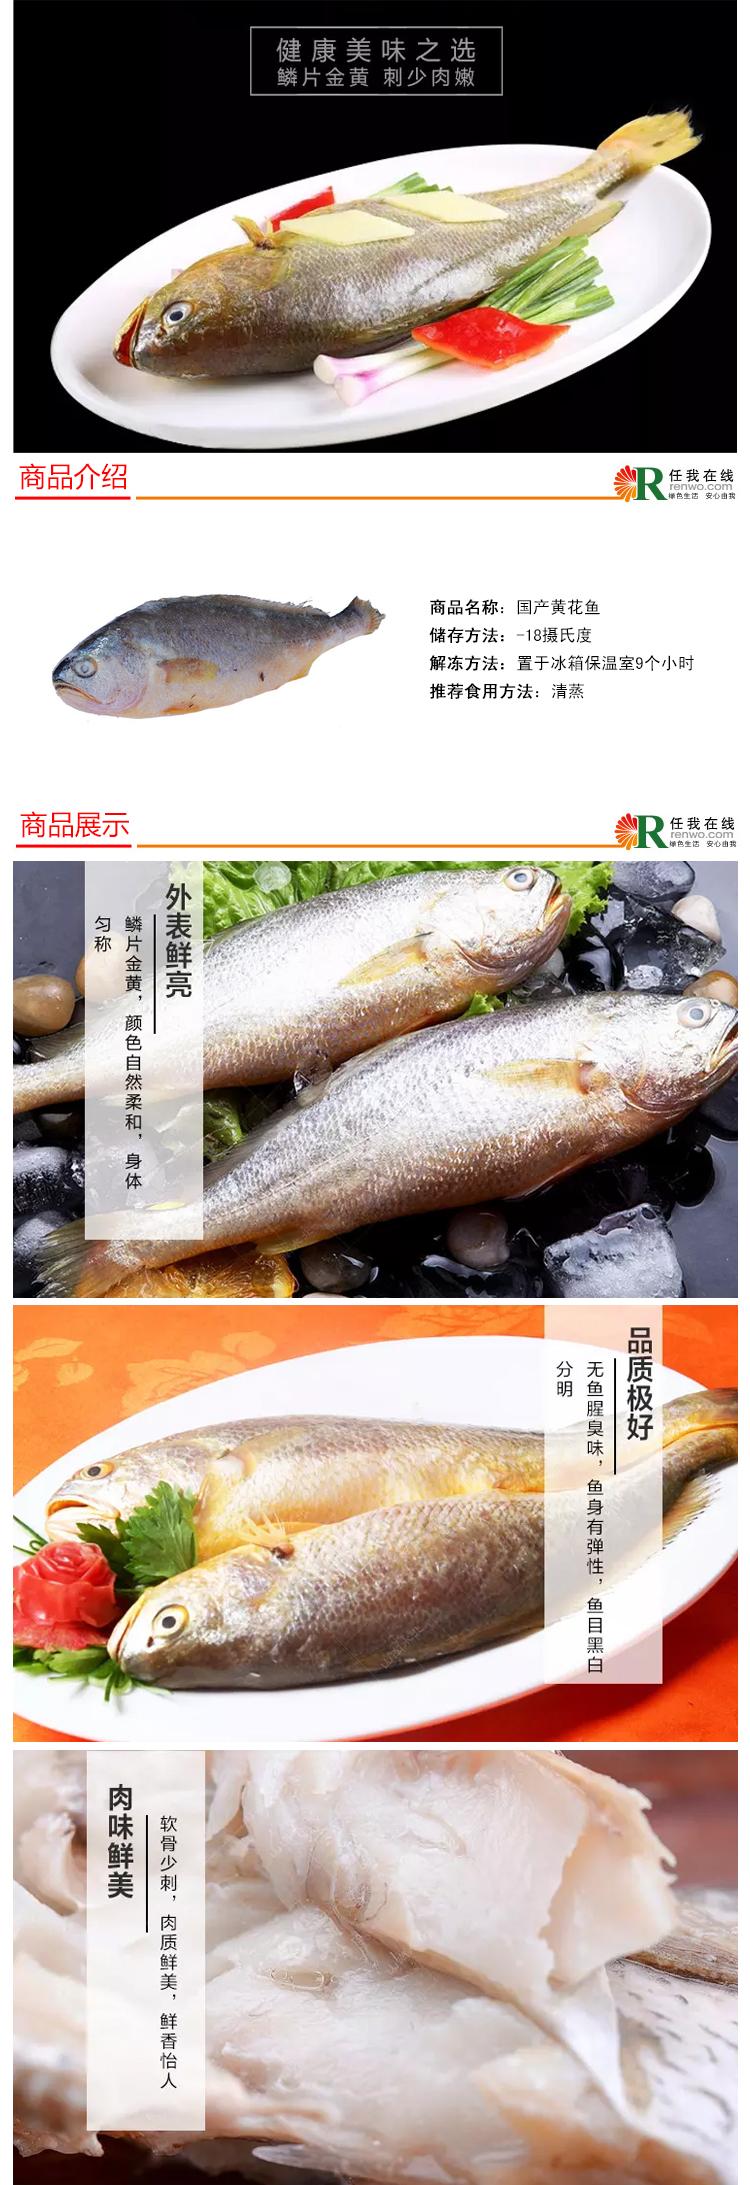 AD_201608110842000594.jpg (750×2185)